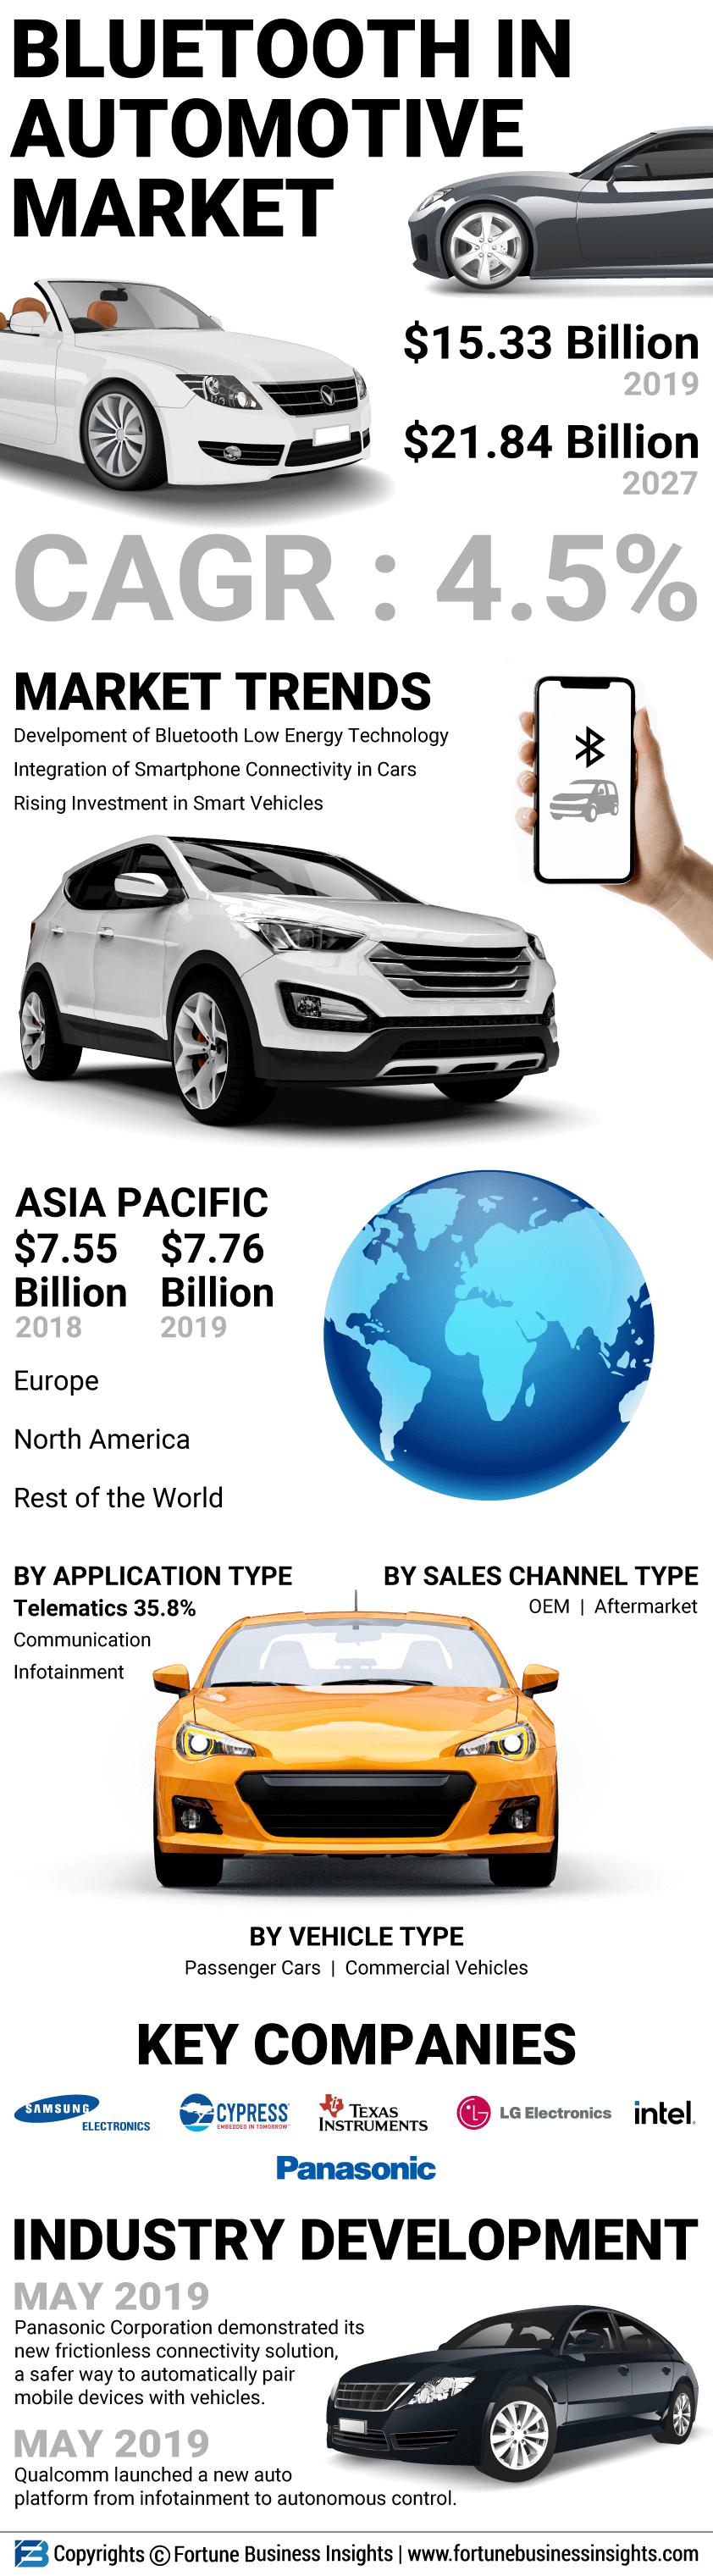 Bluetooth in Automotive Market